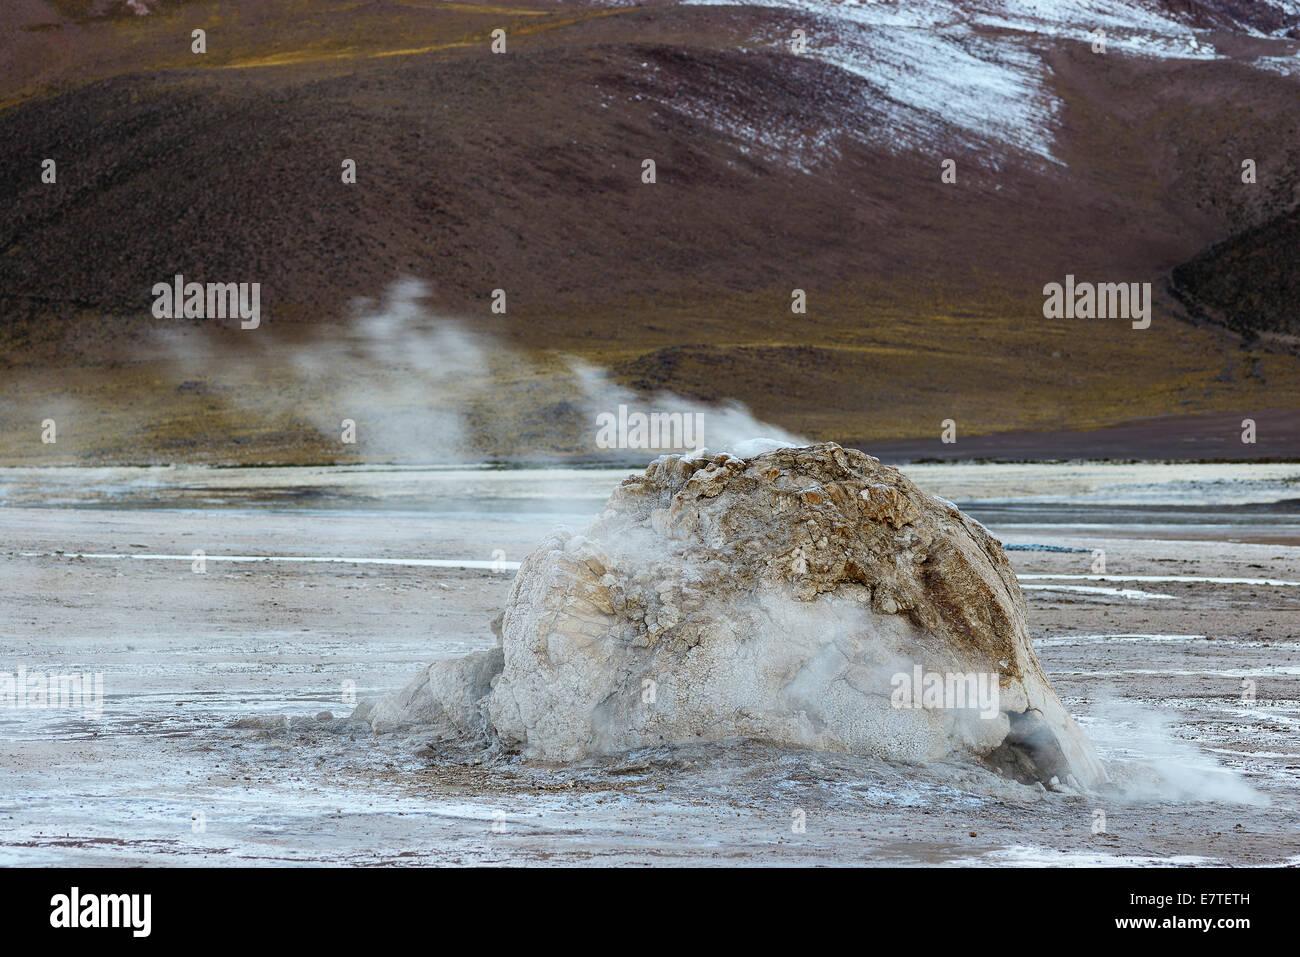 Geyser, geyserite vent releasing steam, El Tatio, the highest geyser field in the world, Antofagasta, on the edge - Stock Image